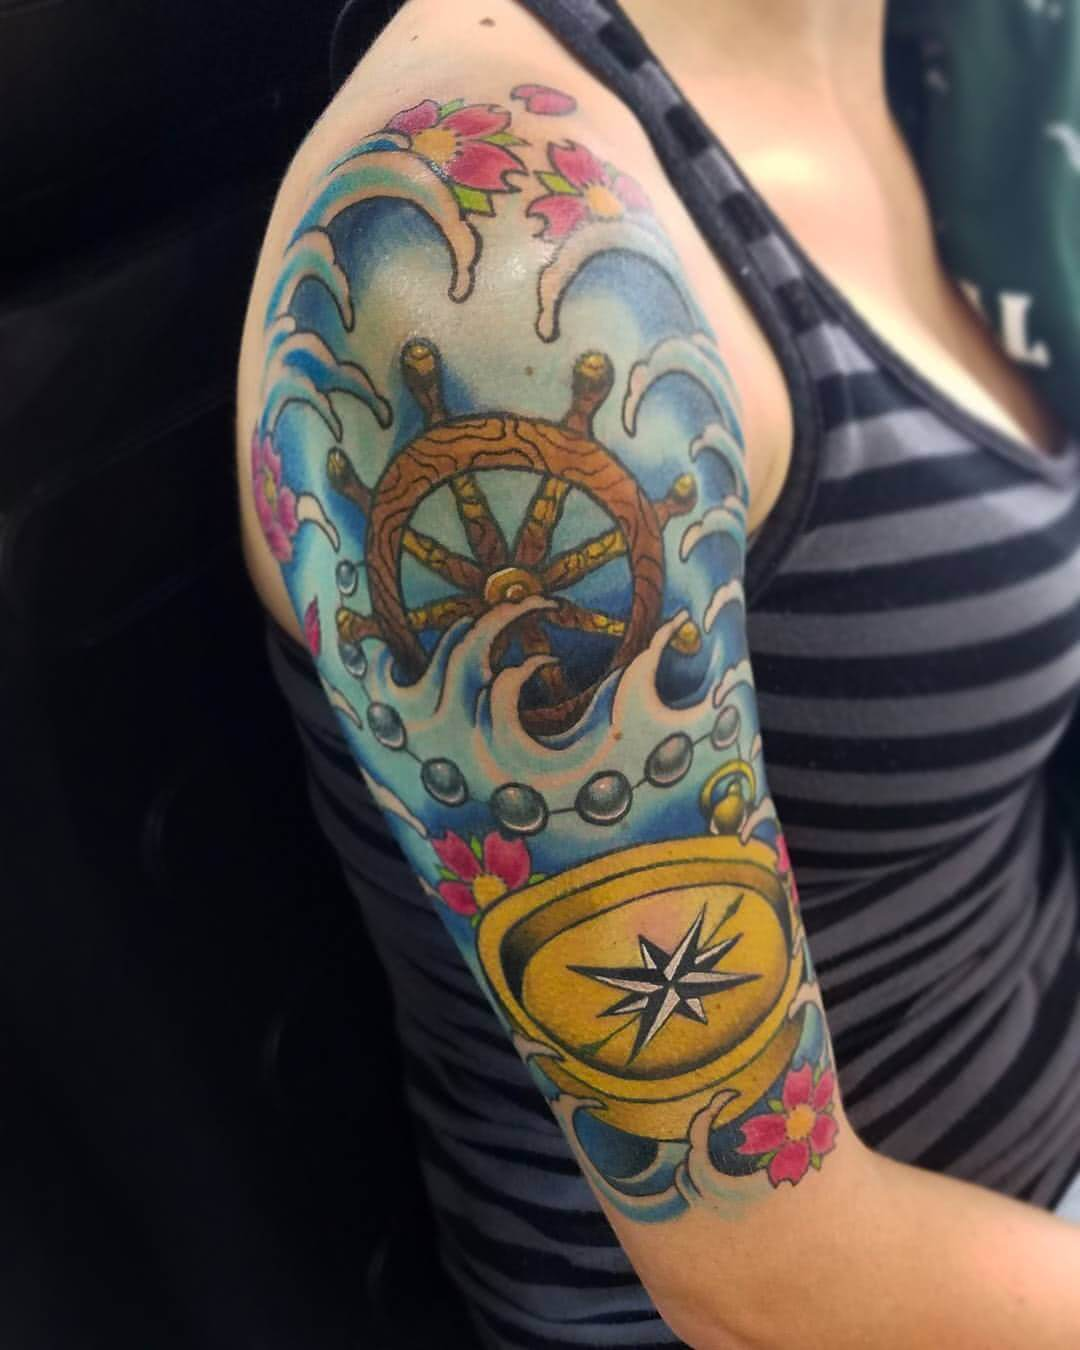 Tattoo Halfsleeve Oldschool Nautic Maritim